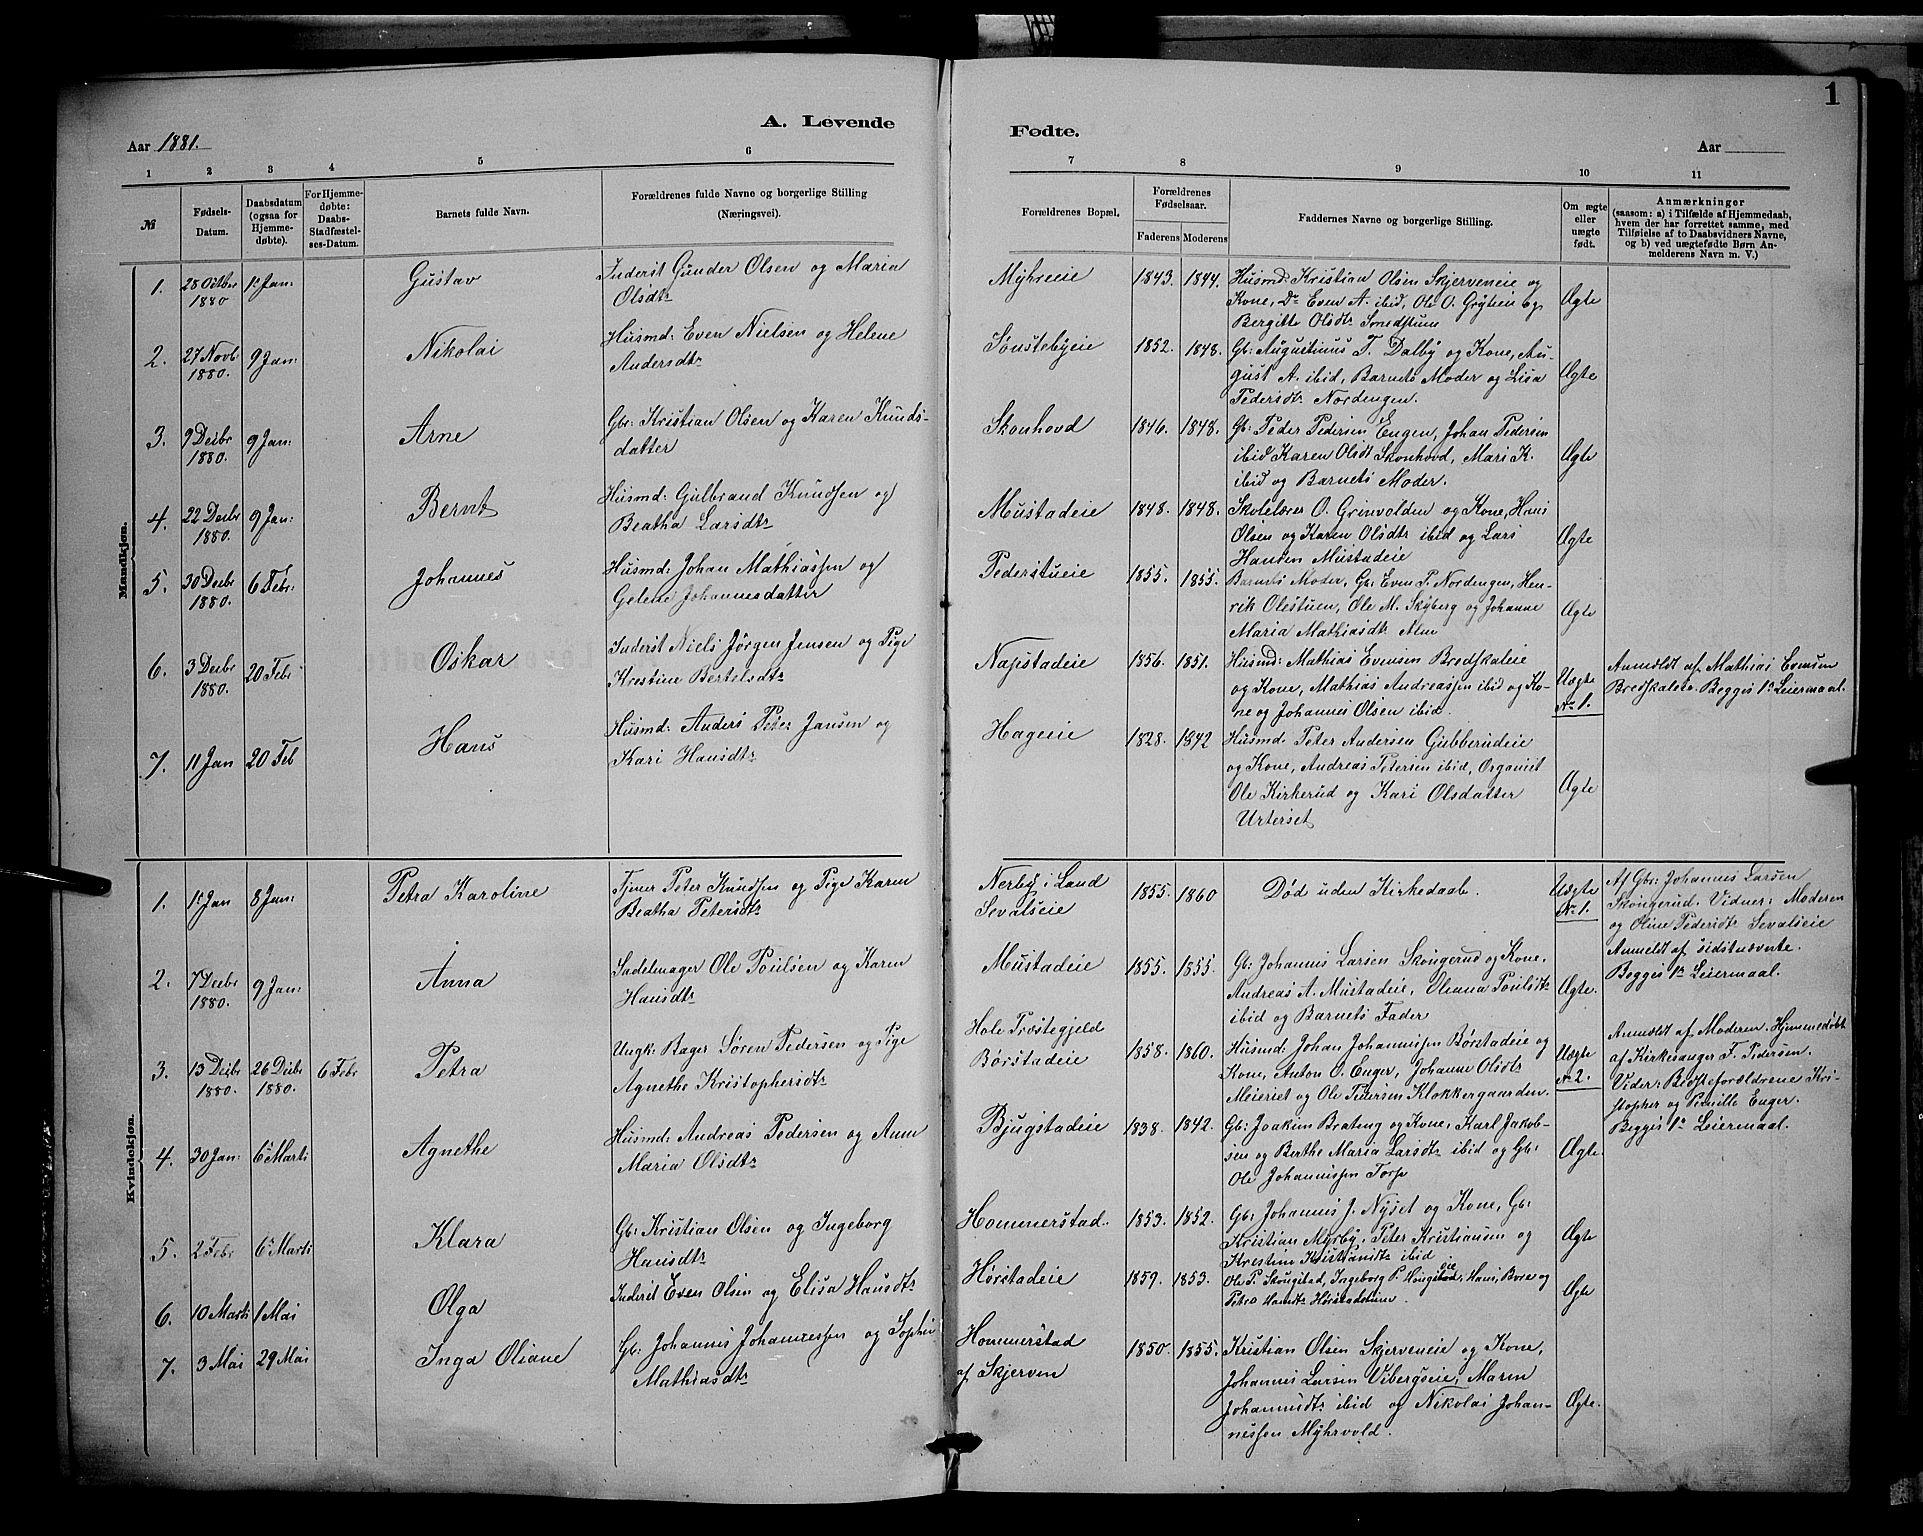 SAH, Vardal prestekontor, H/Ha/Hab/L0008: Klokkerbok nr. 8, 1881-1898, s. 1